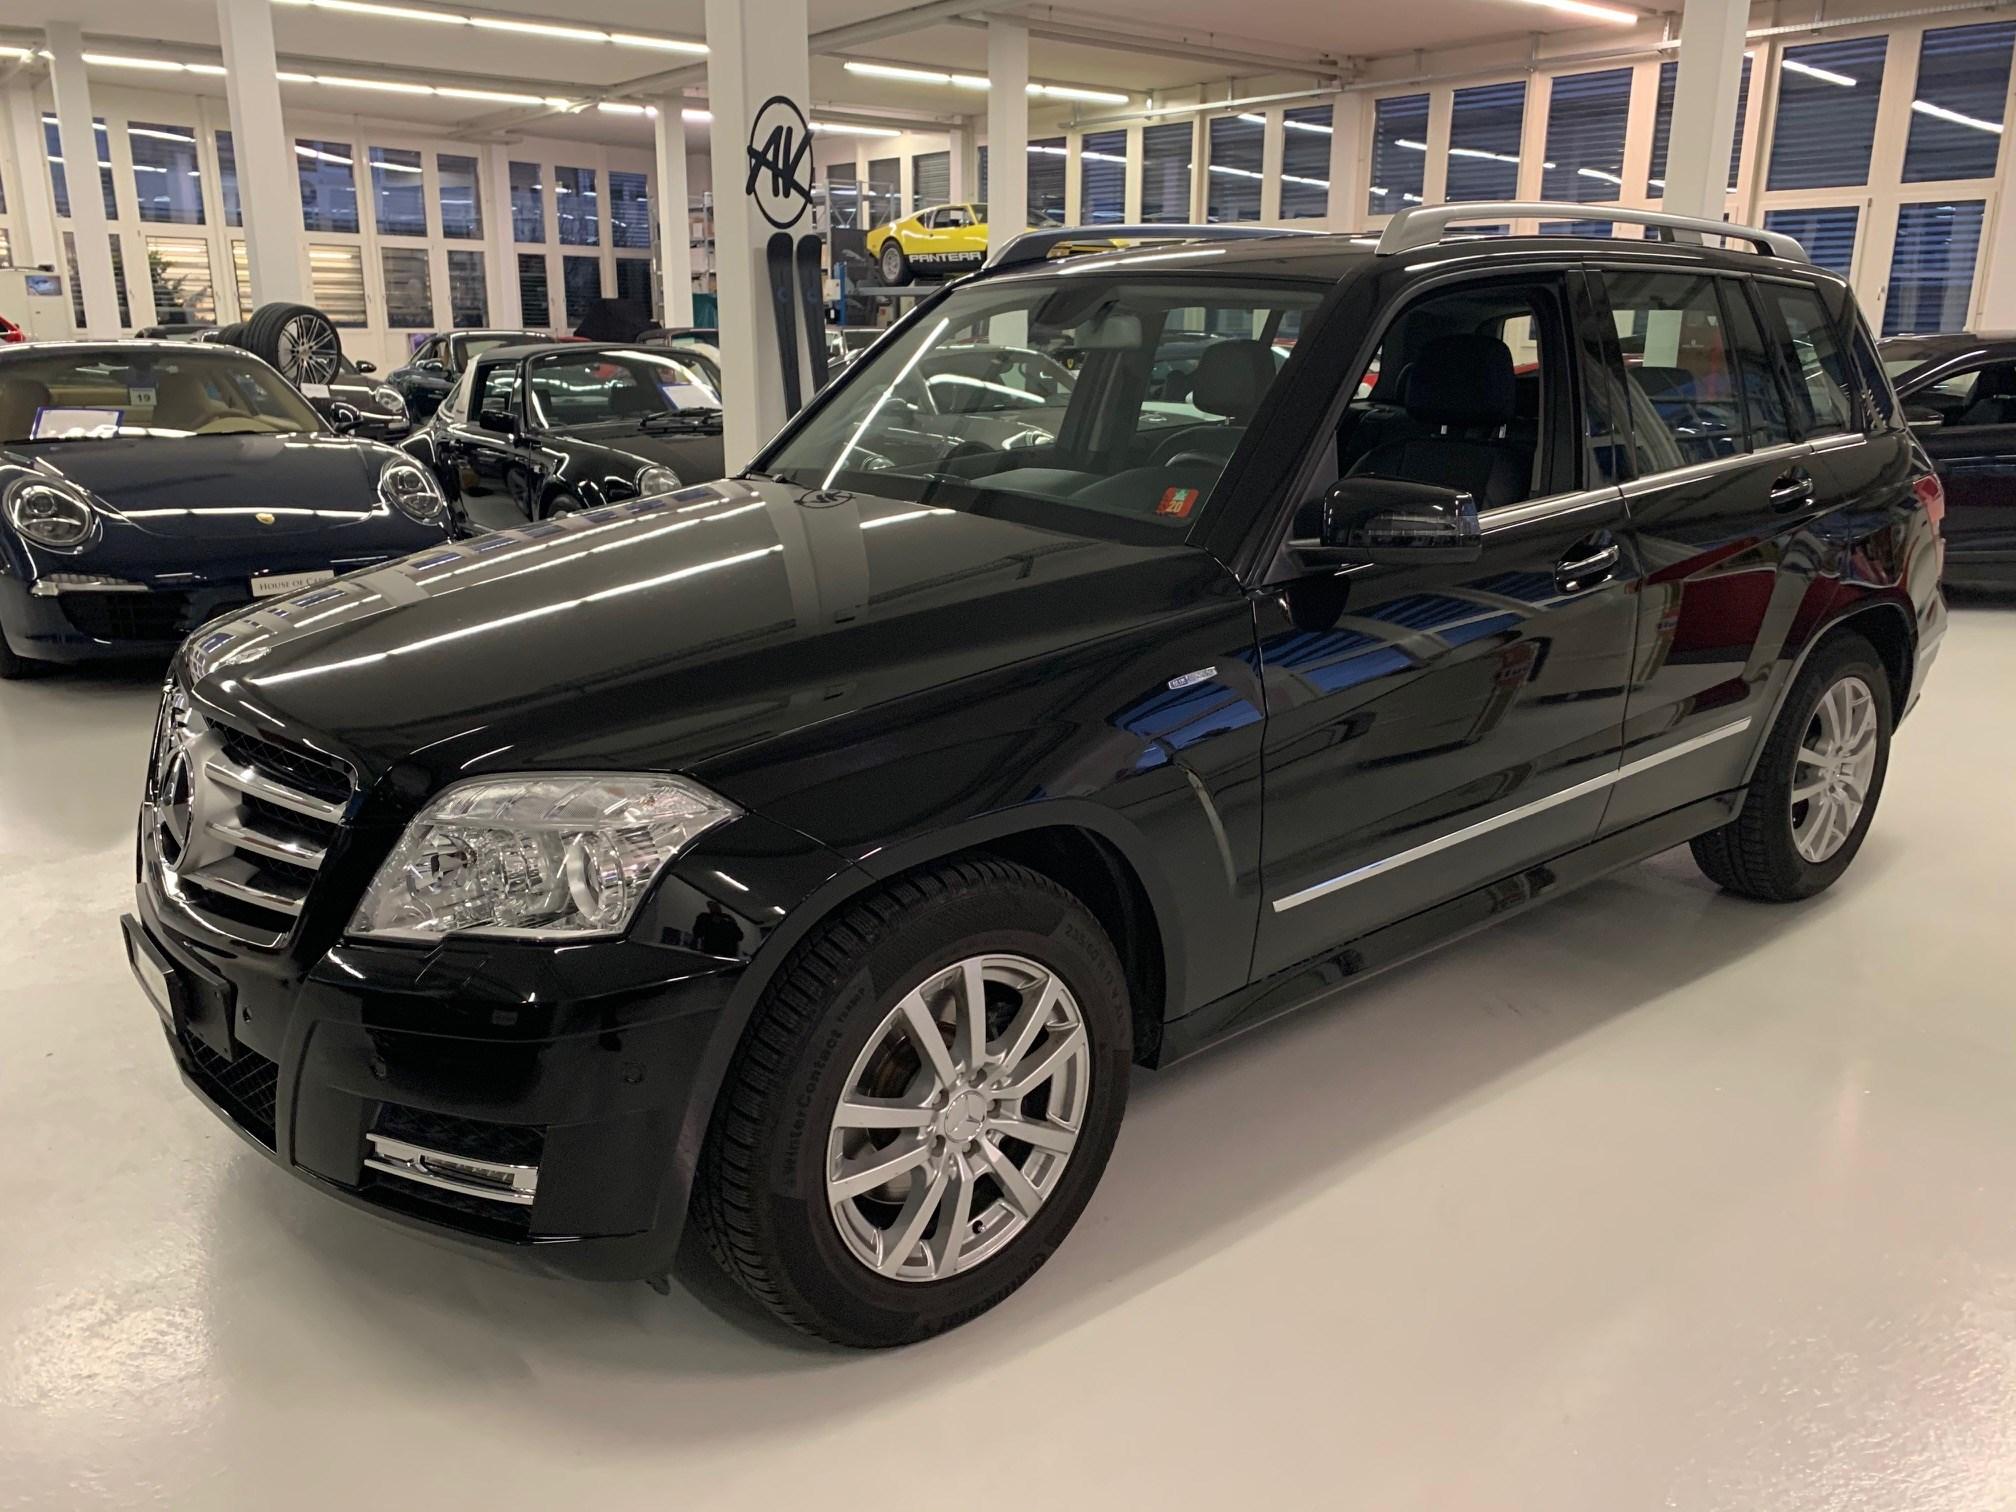 suv Mercedes-Benz GLK-Klasse GLK 250 CDI BlueEfficiency 4Matic 7G-Tronic